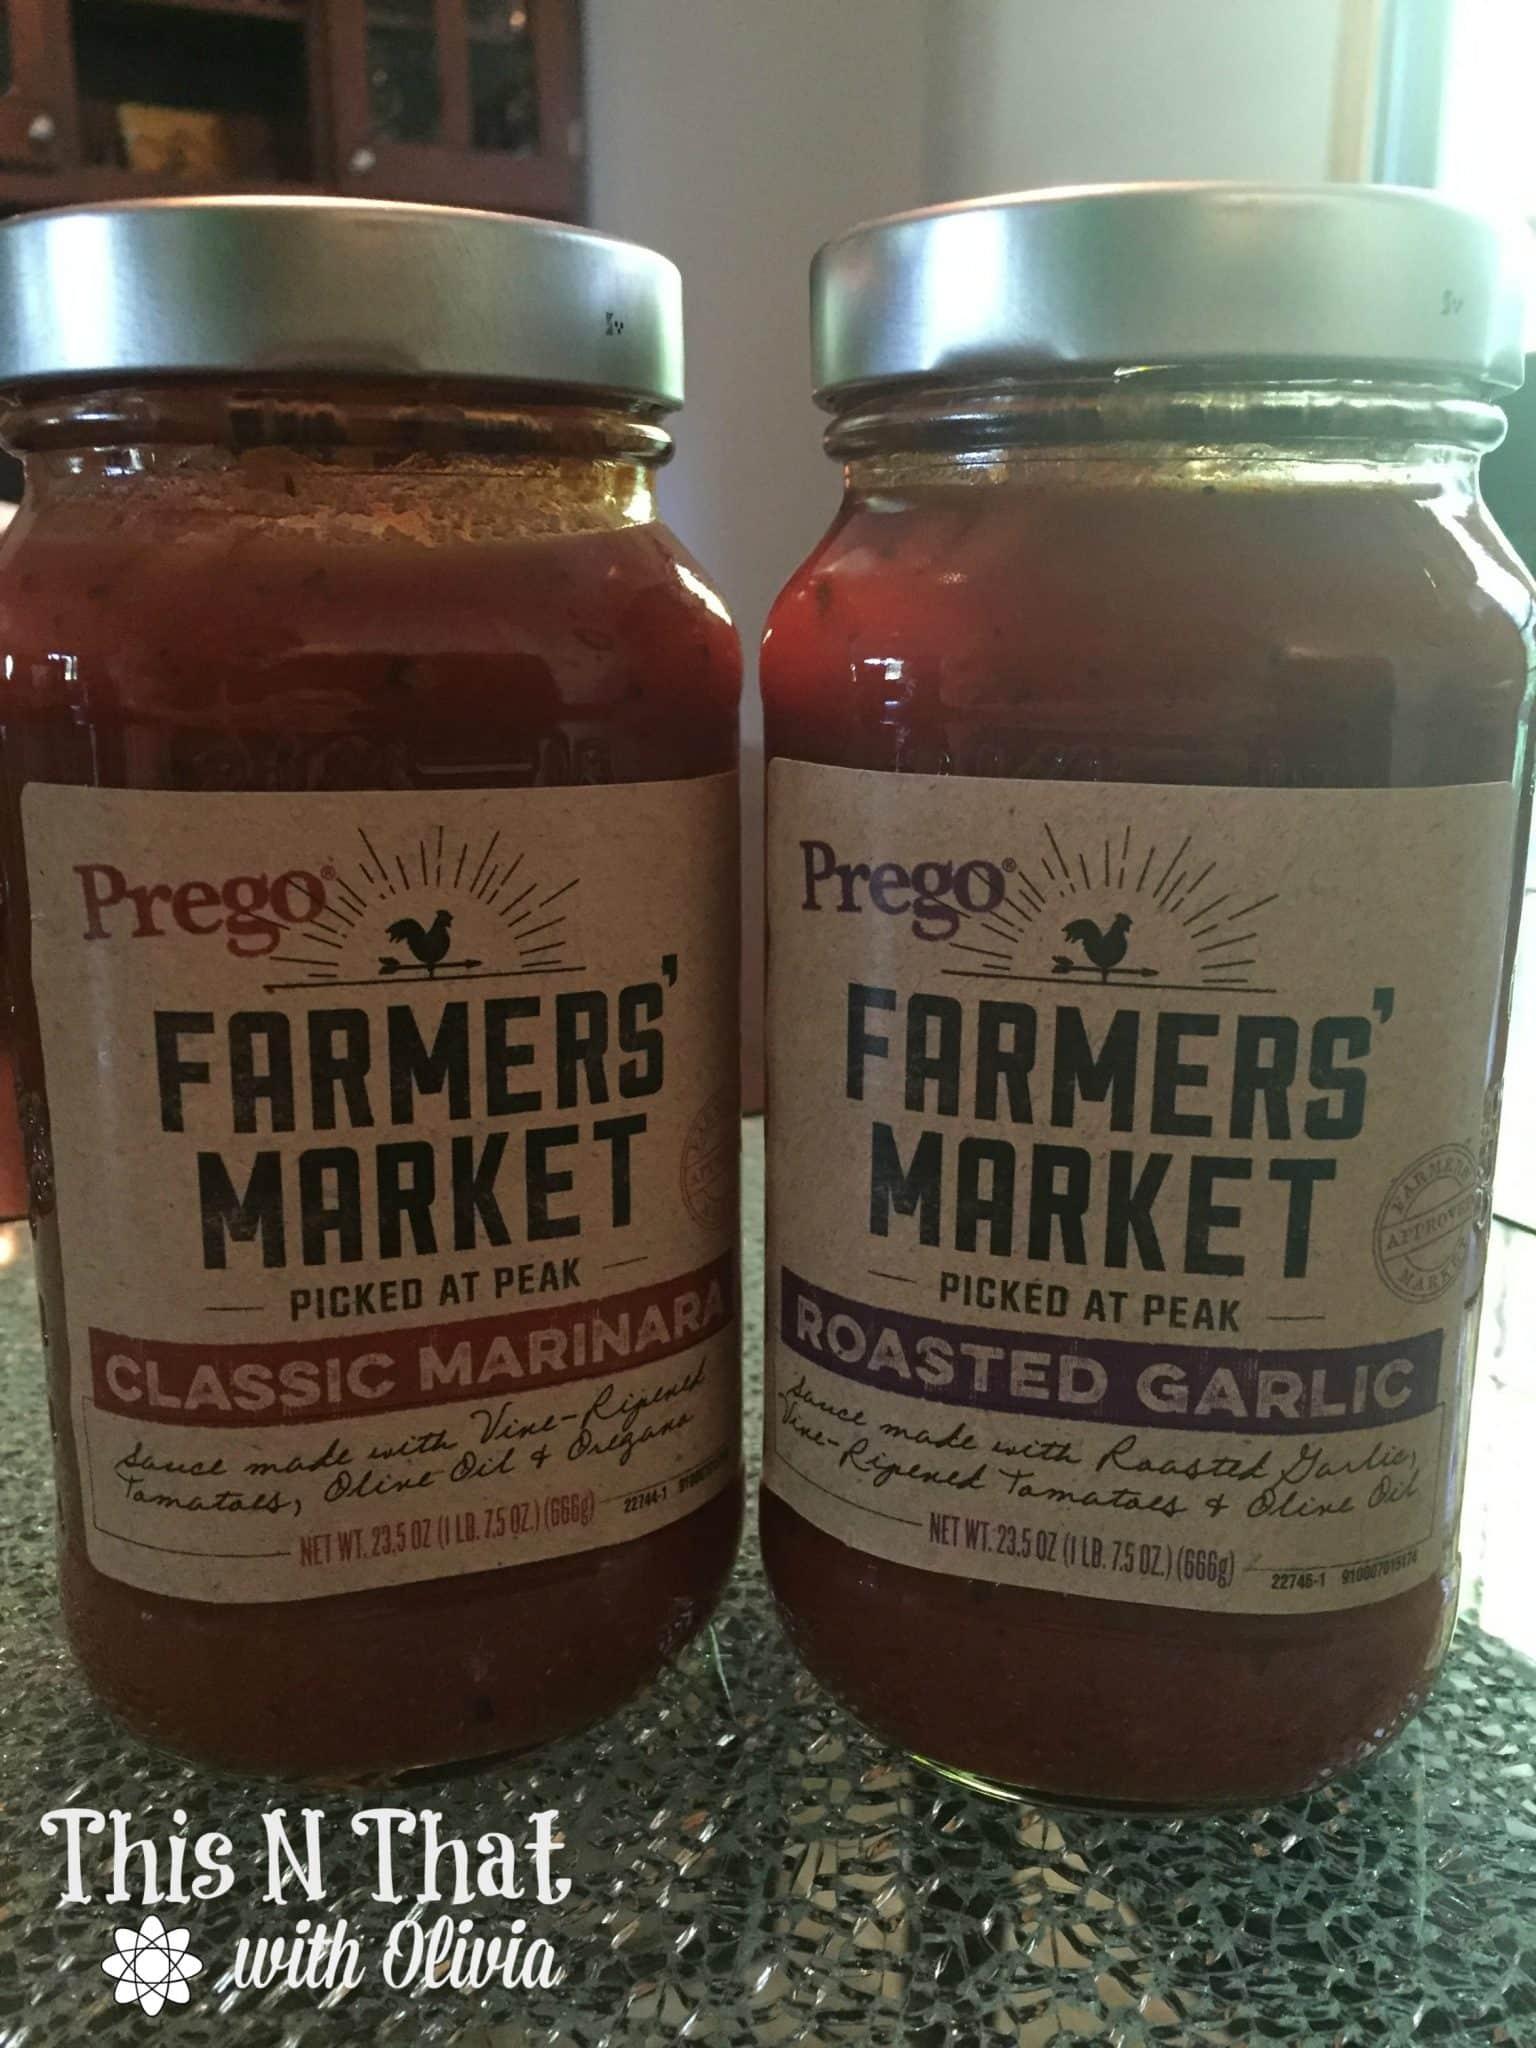 Baked Ziti Recipe using Prego Farmers' Market Sauces #PickedatPeak   ThisNThatwithOlivia.com